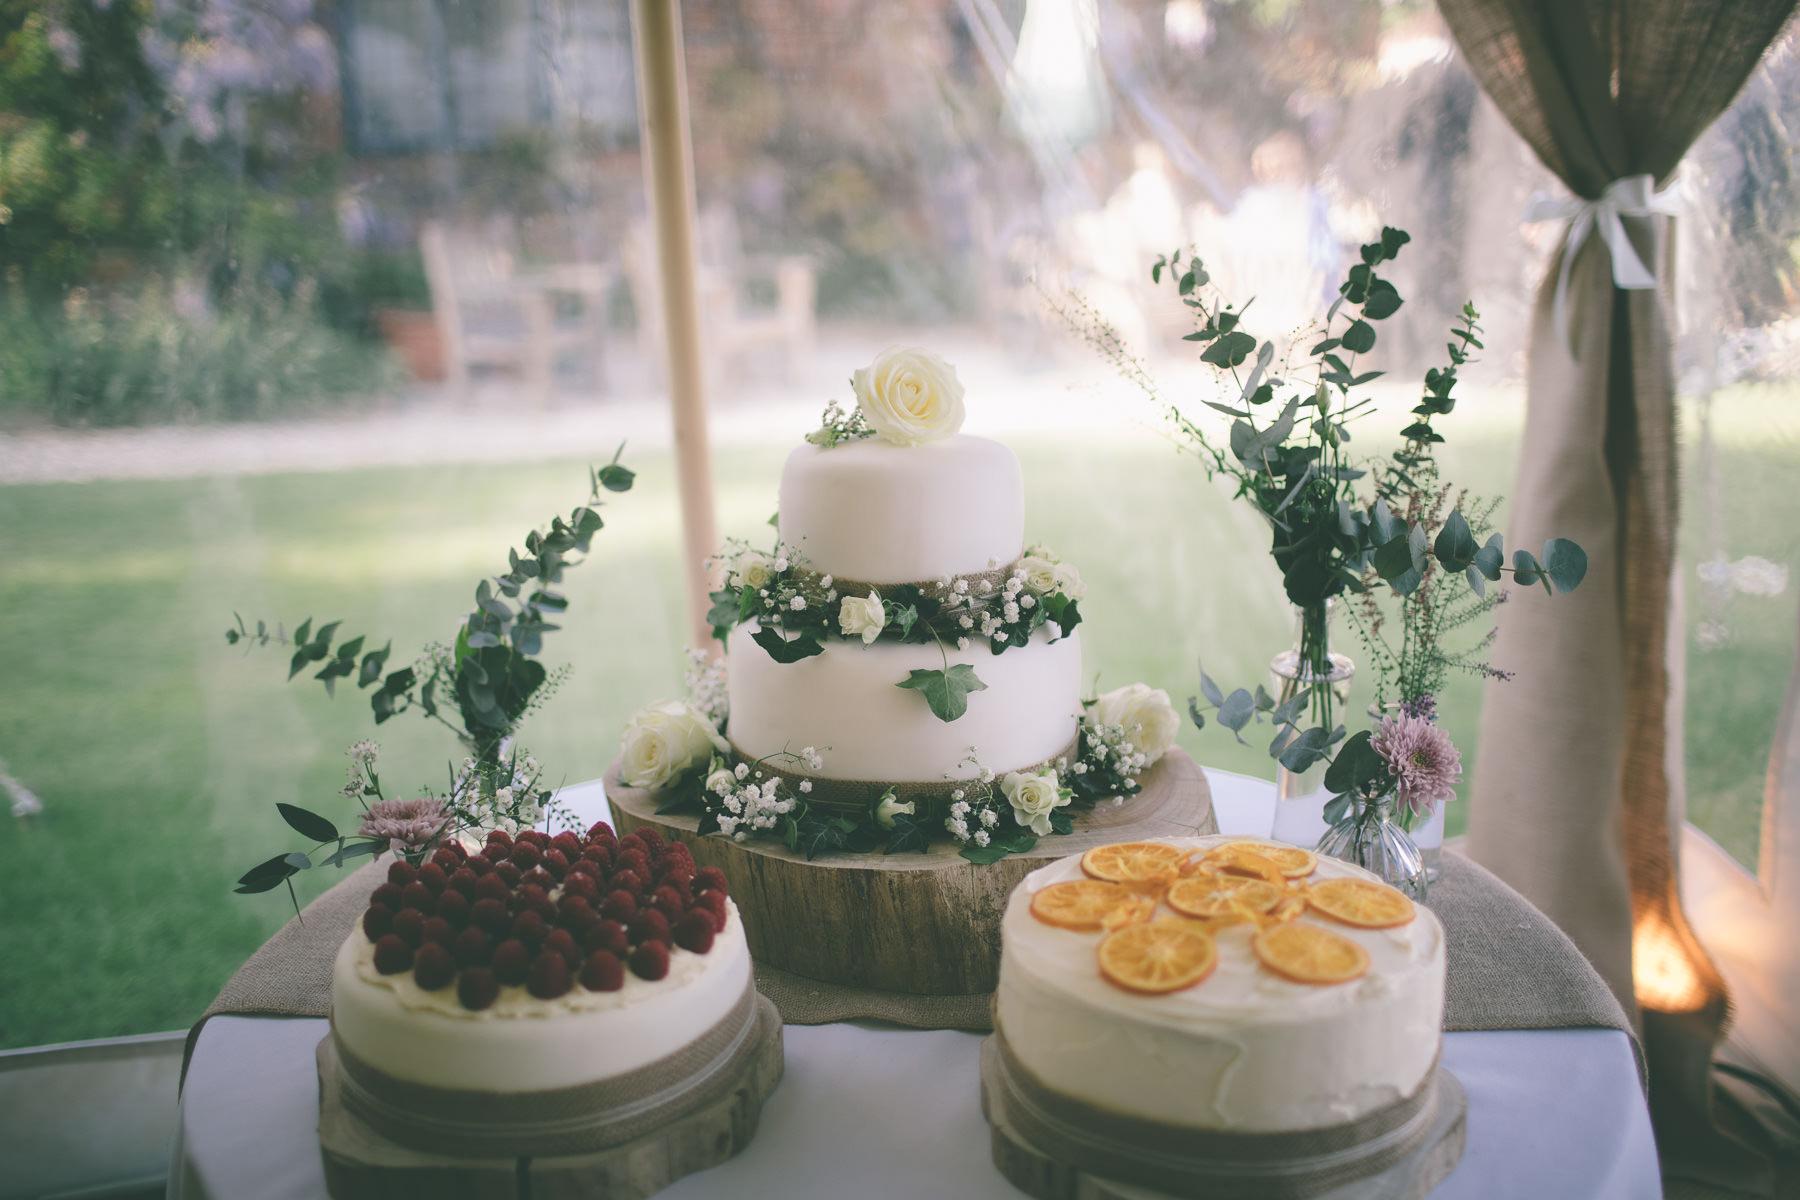 Pamber-Place-wedding-photography-basingstoke-hampshire-174